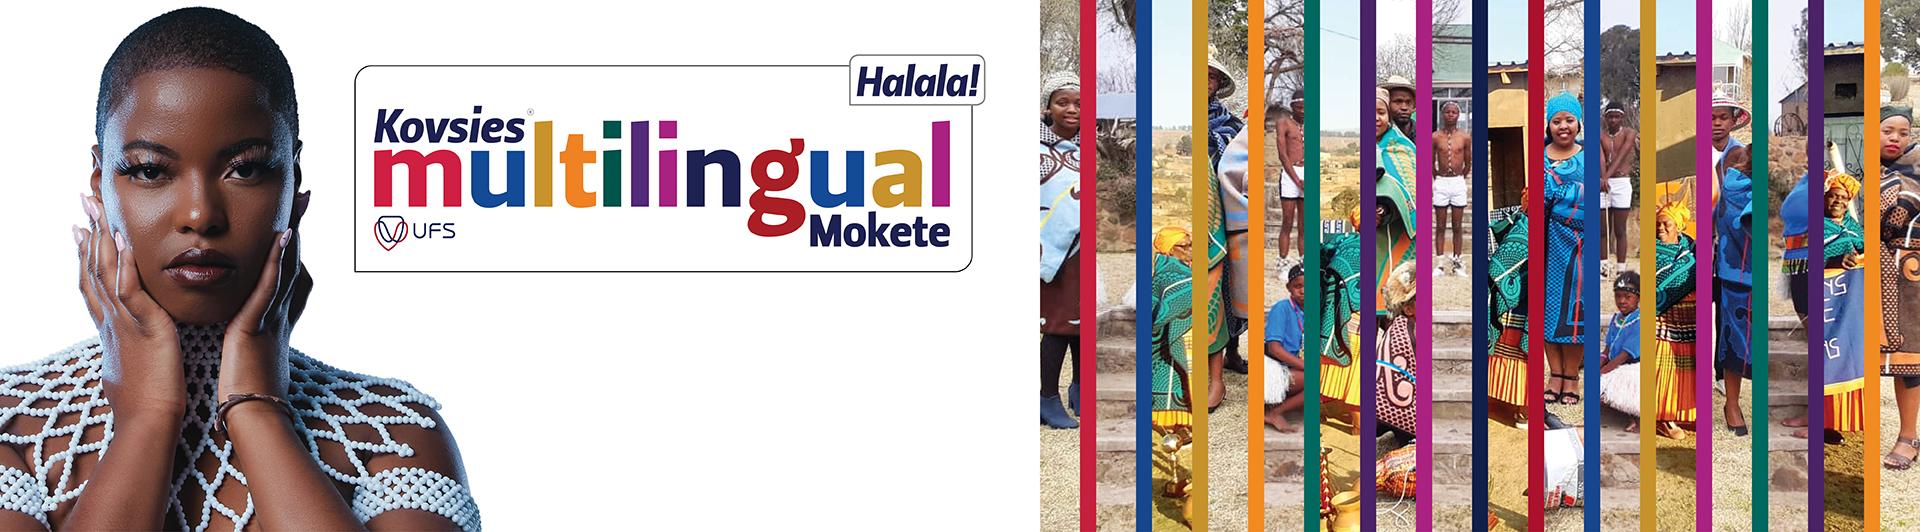 Kovsies Multilingual Mokete Afrikaans English Sesotho Zulu